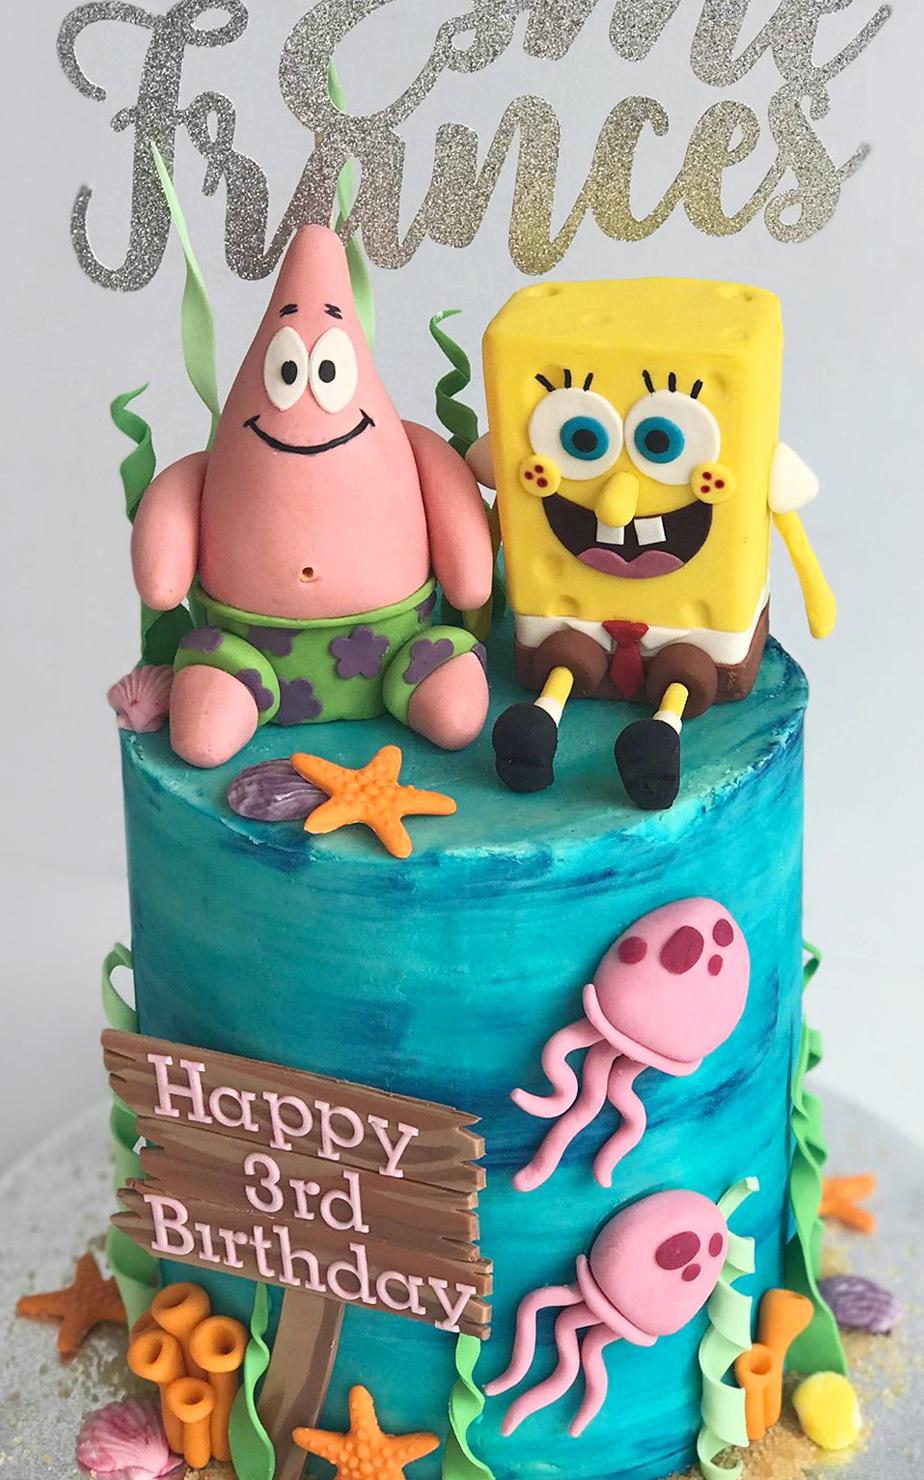 Wondrous Spongebob Birthday Cake Celebration Cakes Antonias Cake Shop Funny Birthday Cards Online Aeocydamsfinfo